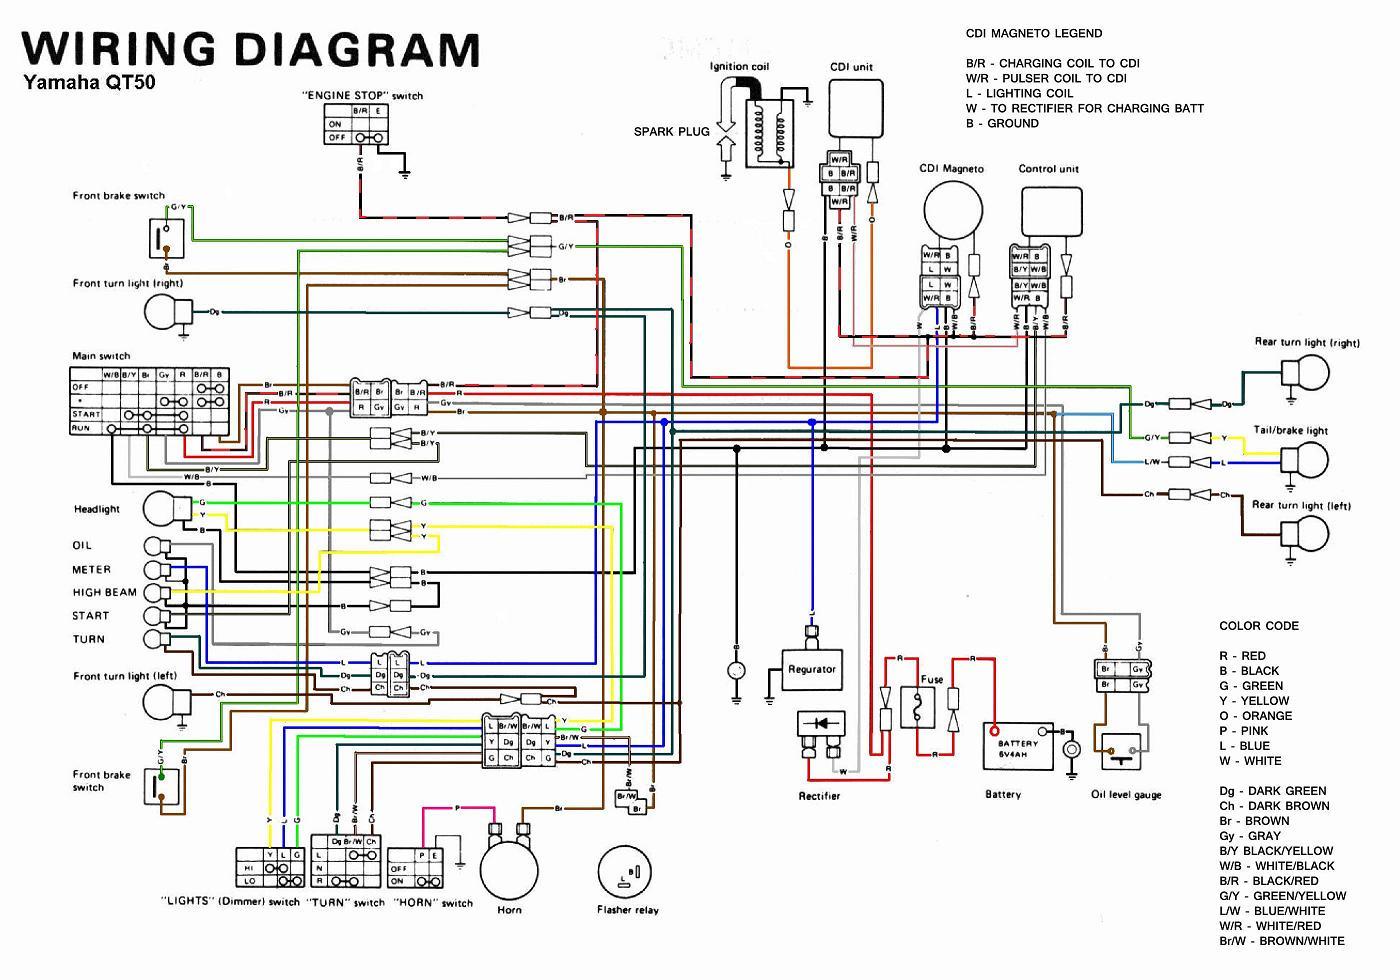 nice yamaha xs1100 wiring diagram photos electrical diagram ideas rh piotomar info Yamaha Rhino 450 Wiring Diagram Yamaha Raider Wiring-Diagram